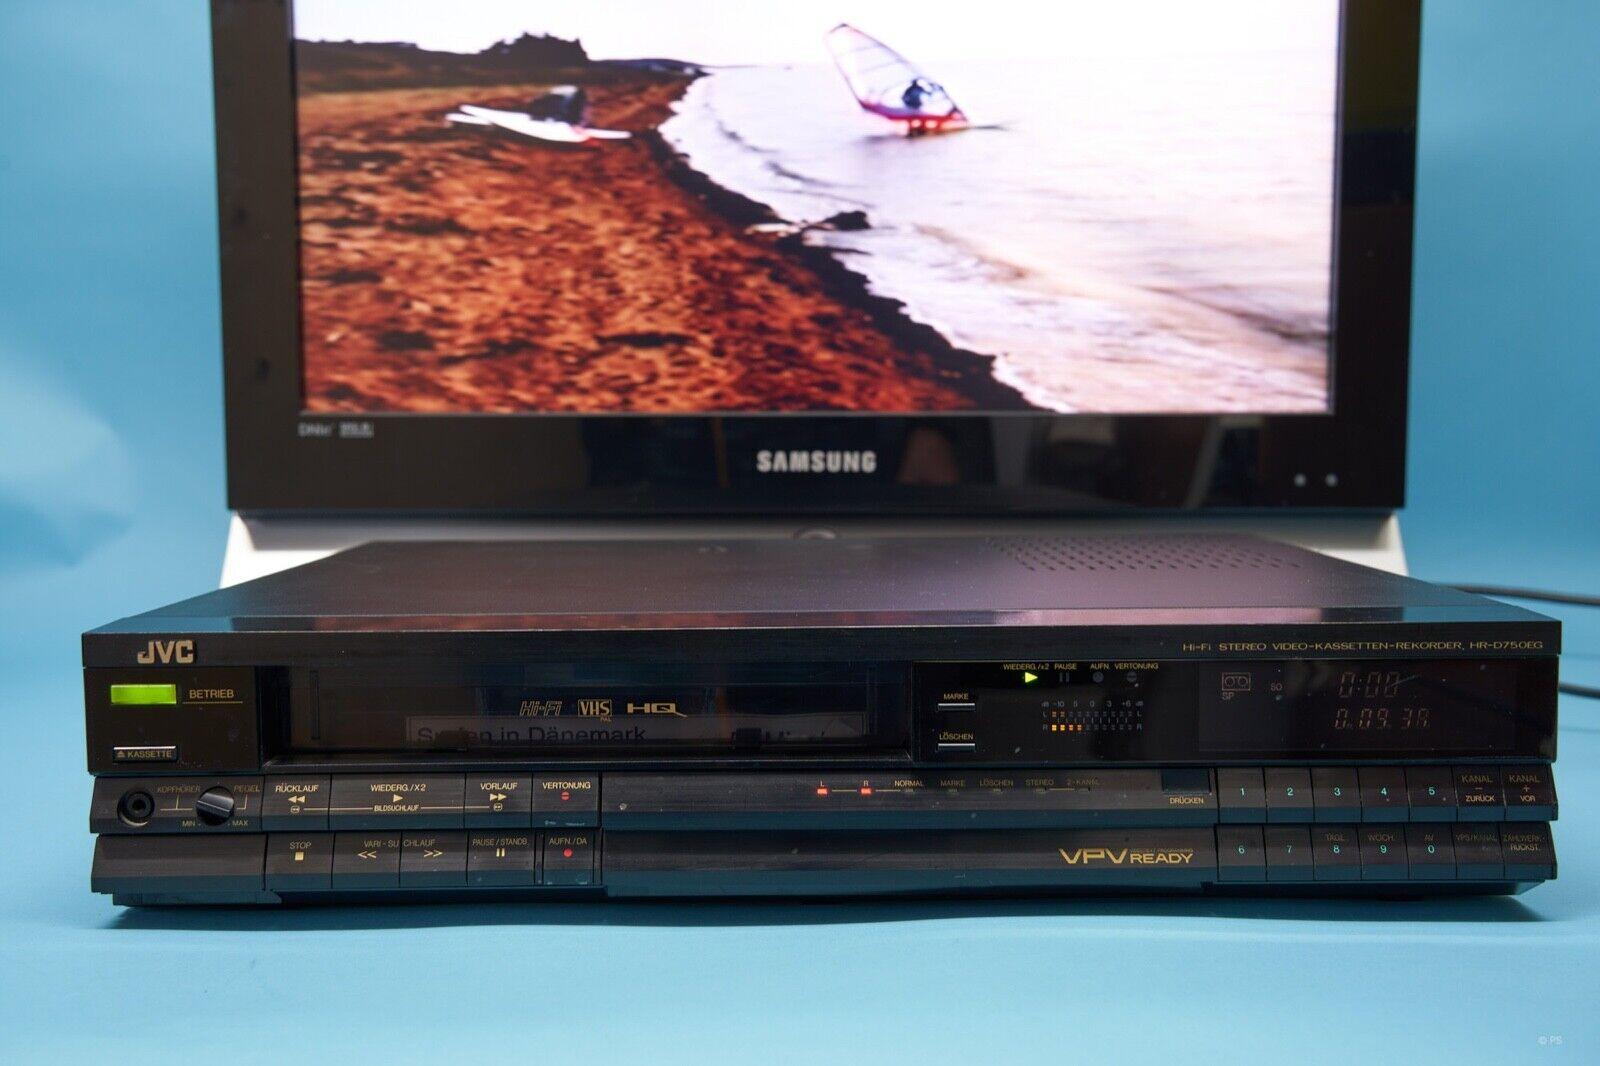 JVC HR-D750EG VHS-Videorekorder